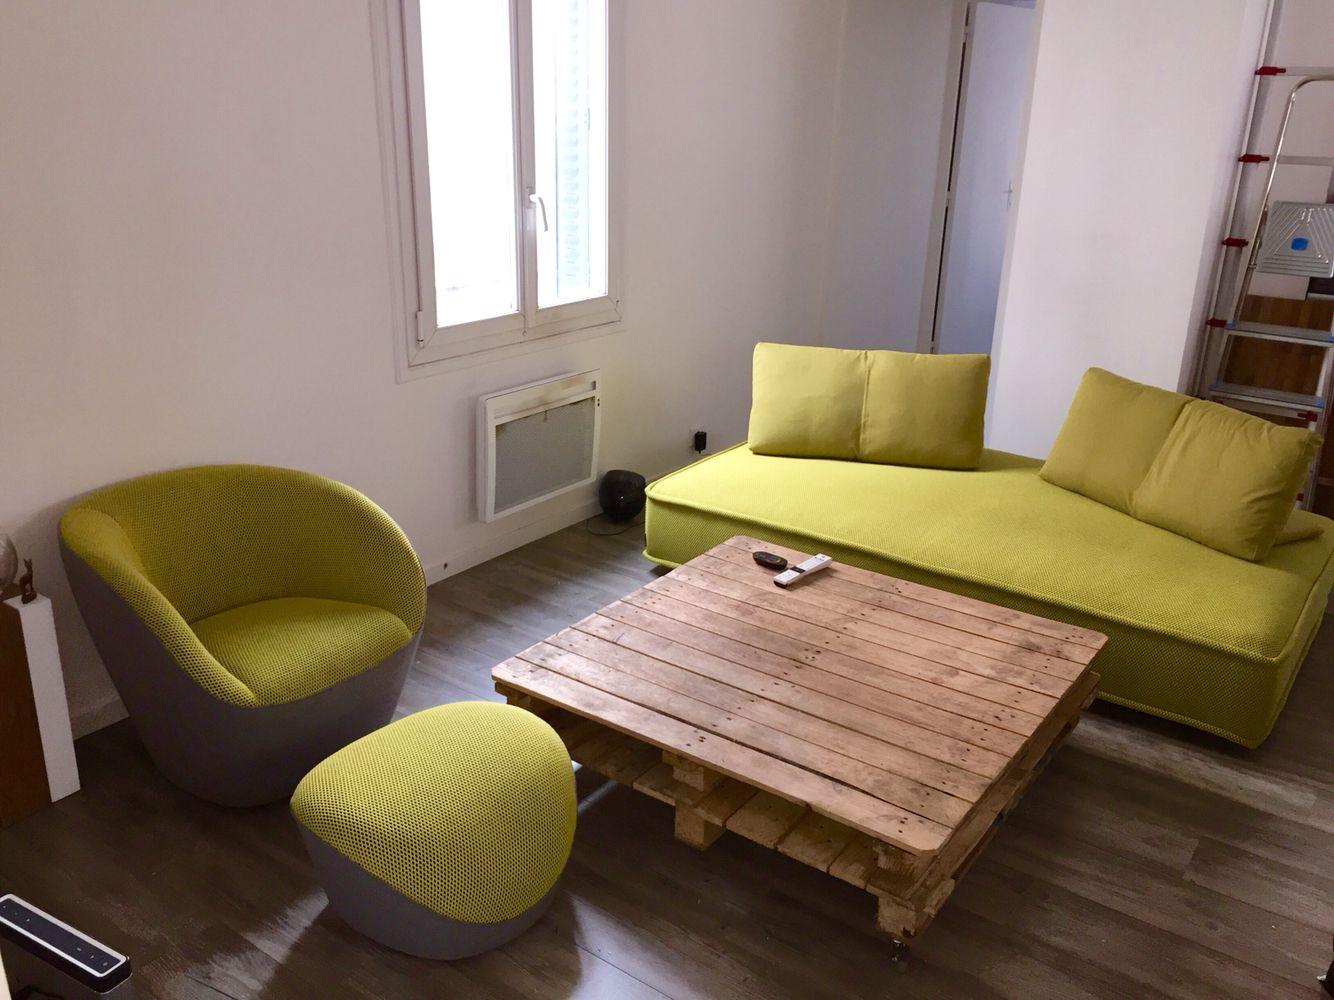 Roche bobois escapade Пуфы modular sofa living furniture et sofa